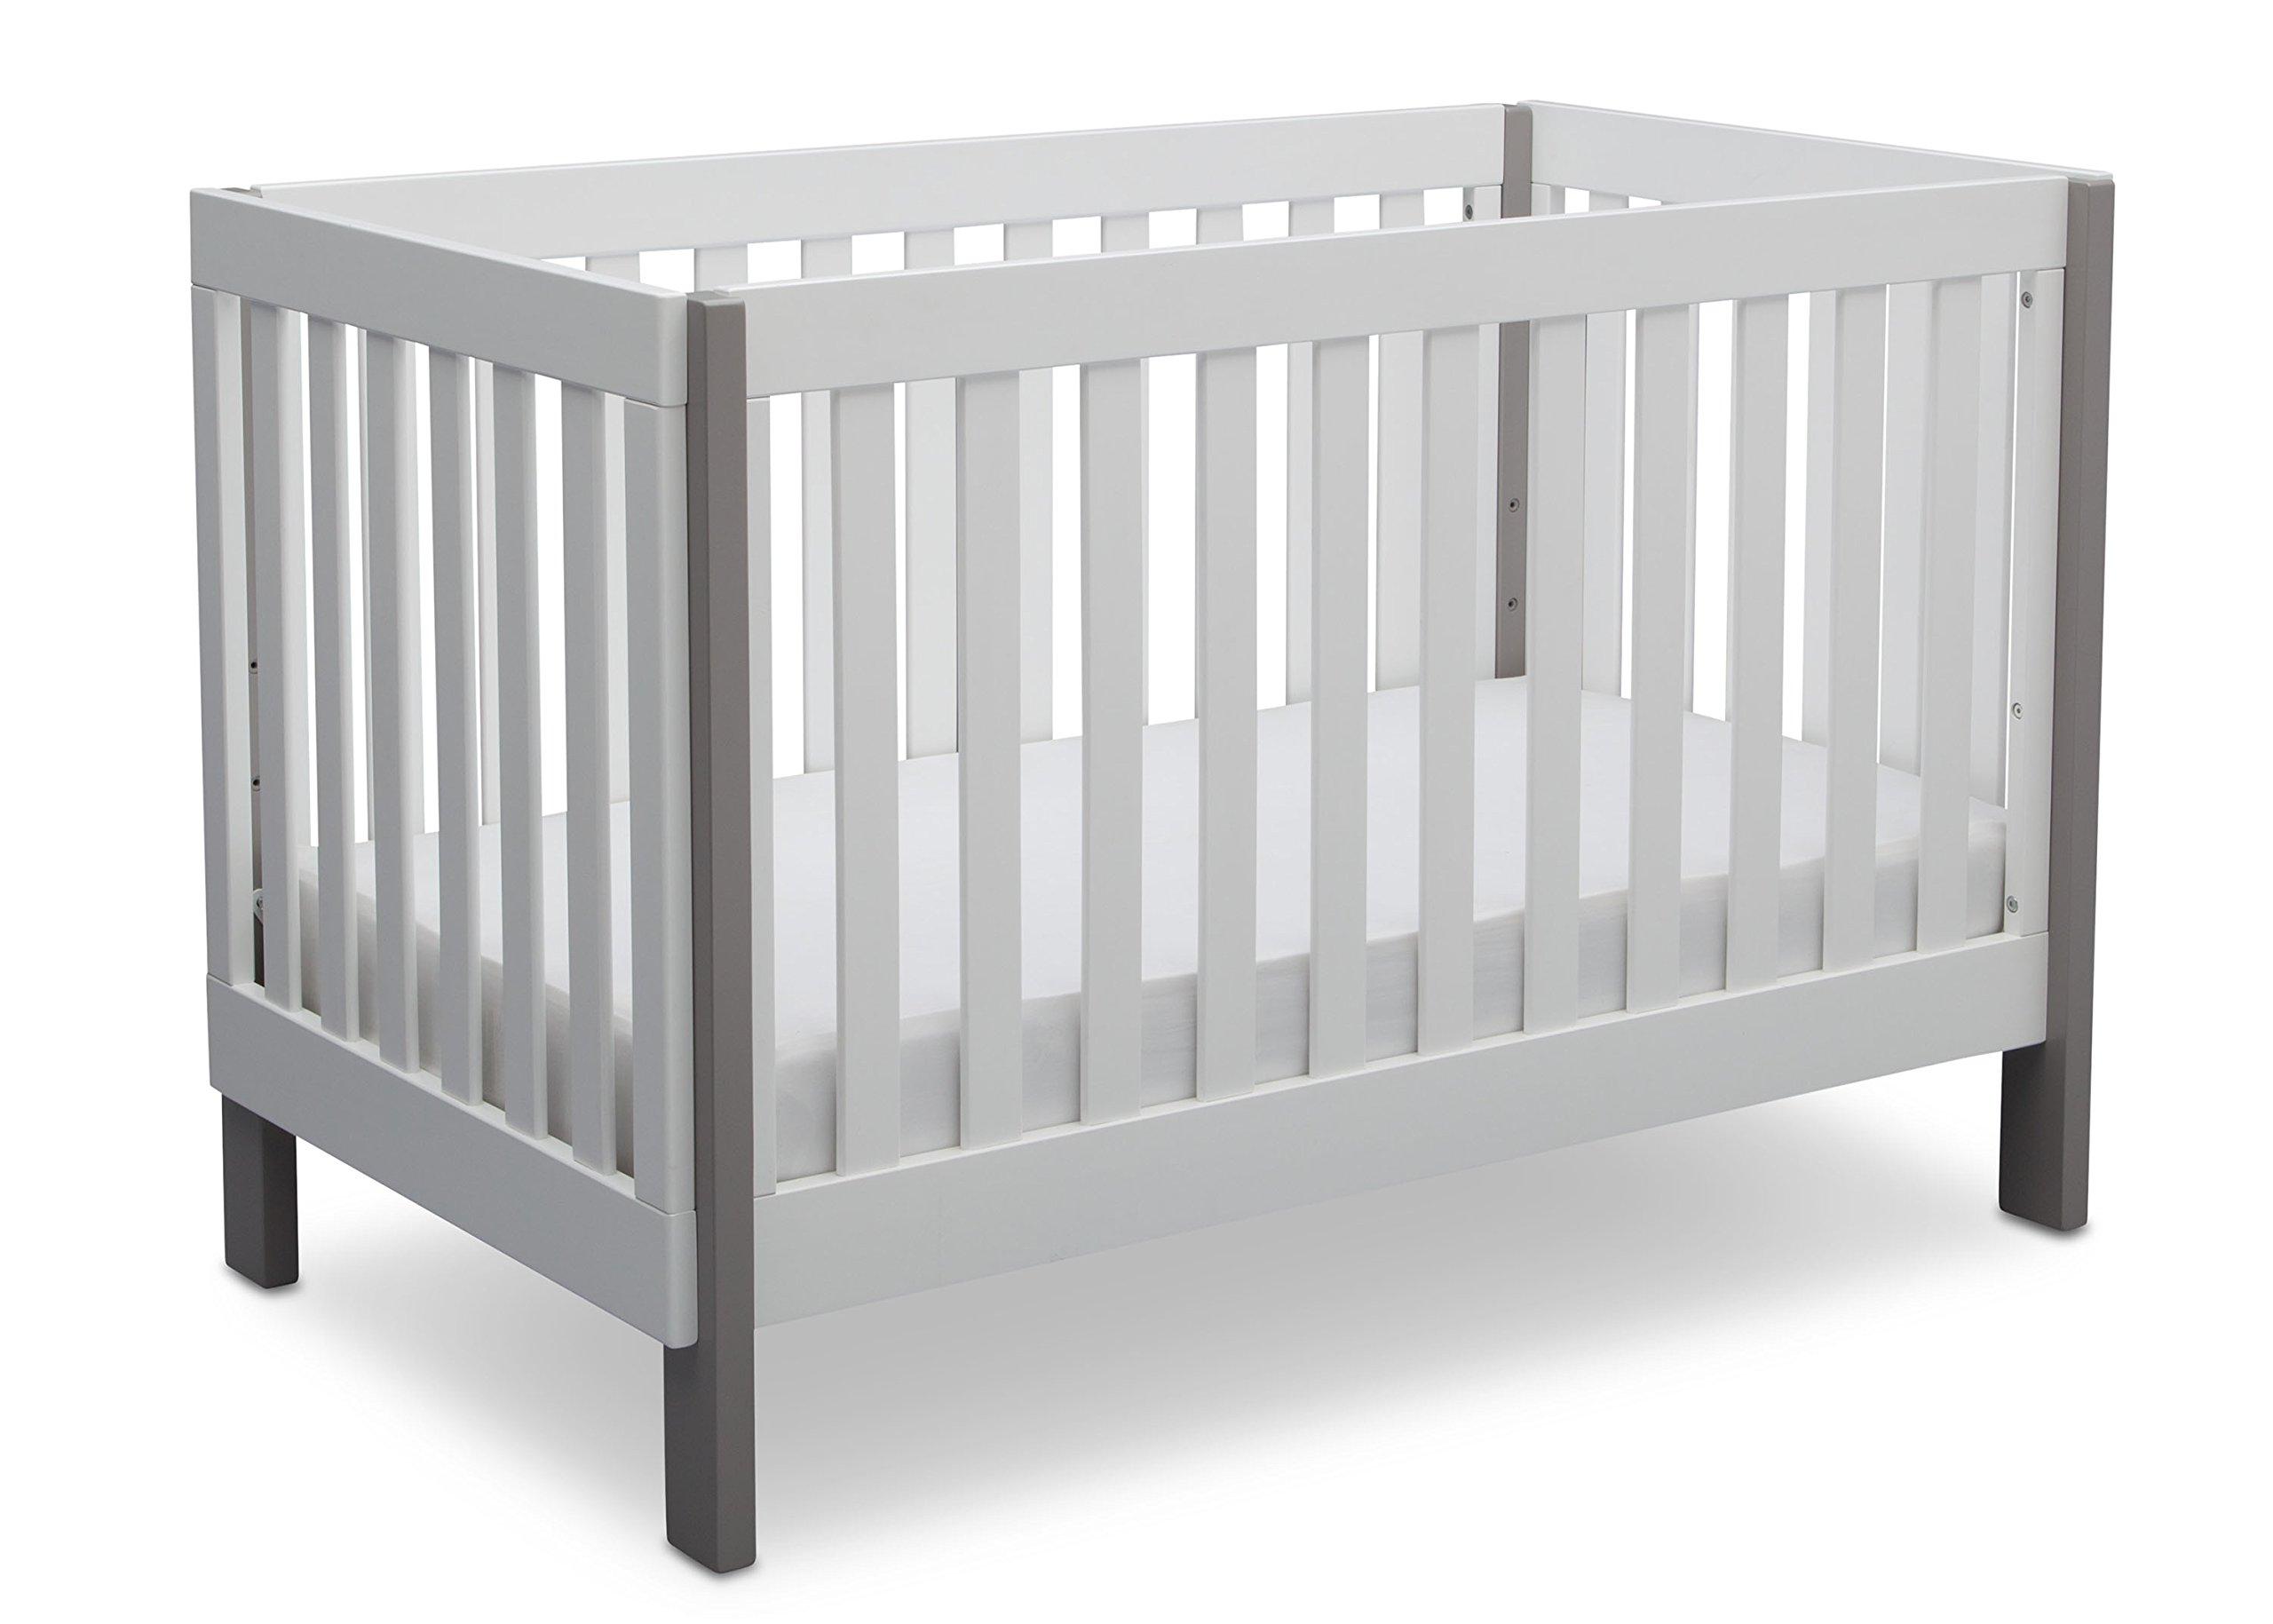 Delta Children Bellevue 3-in-1 Convertible Crib, Bianca with Grey